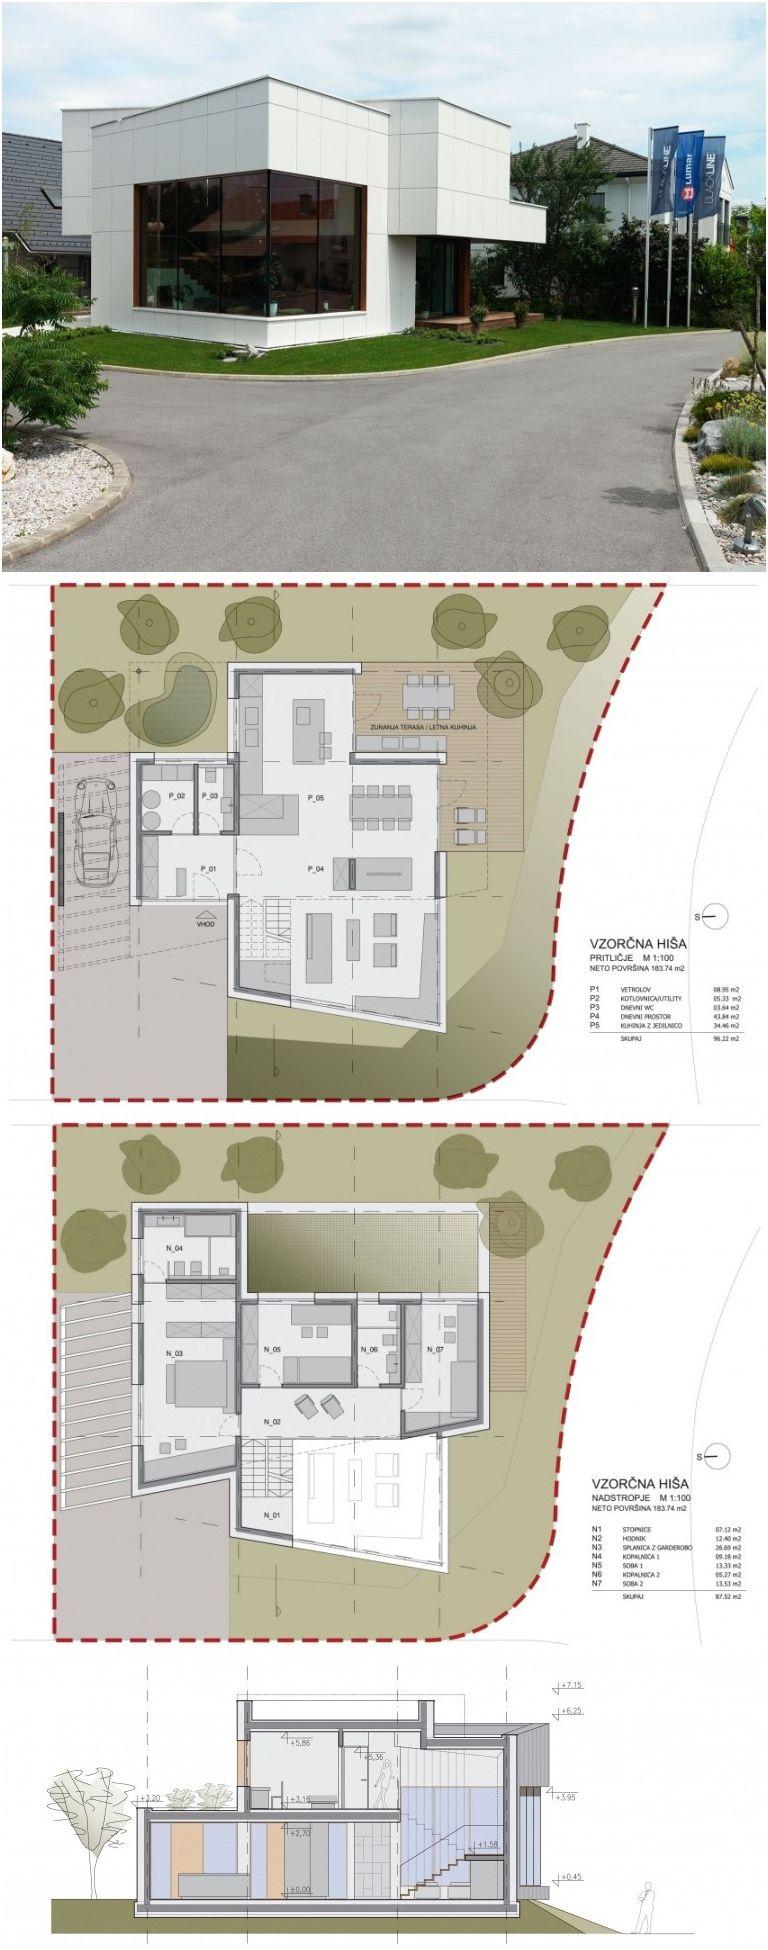 musterhaus vienna by sono arhitekti - Vienna House Plans